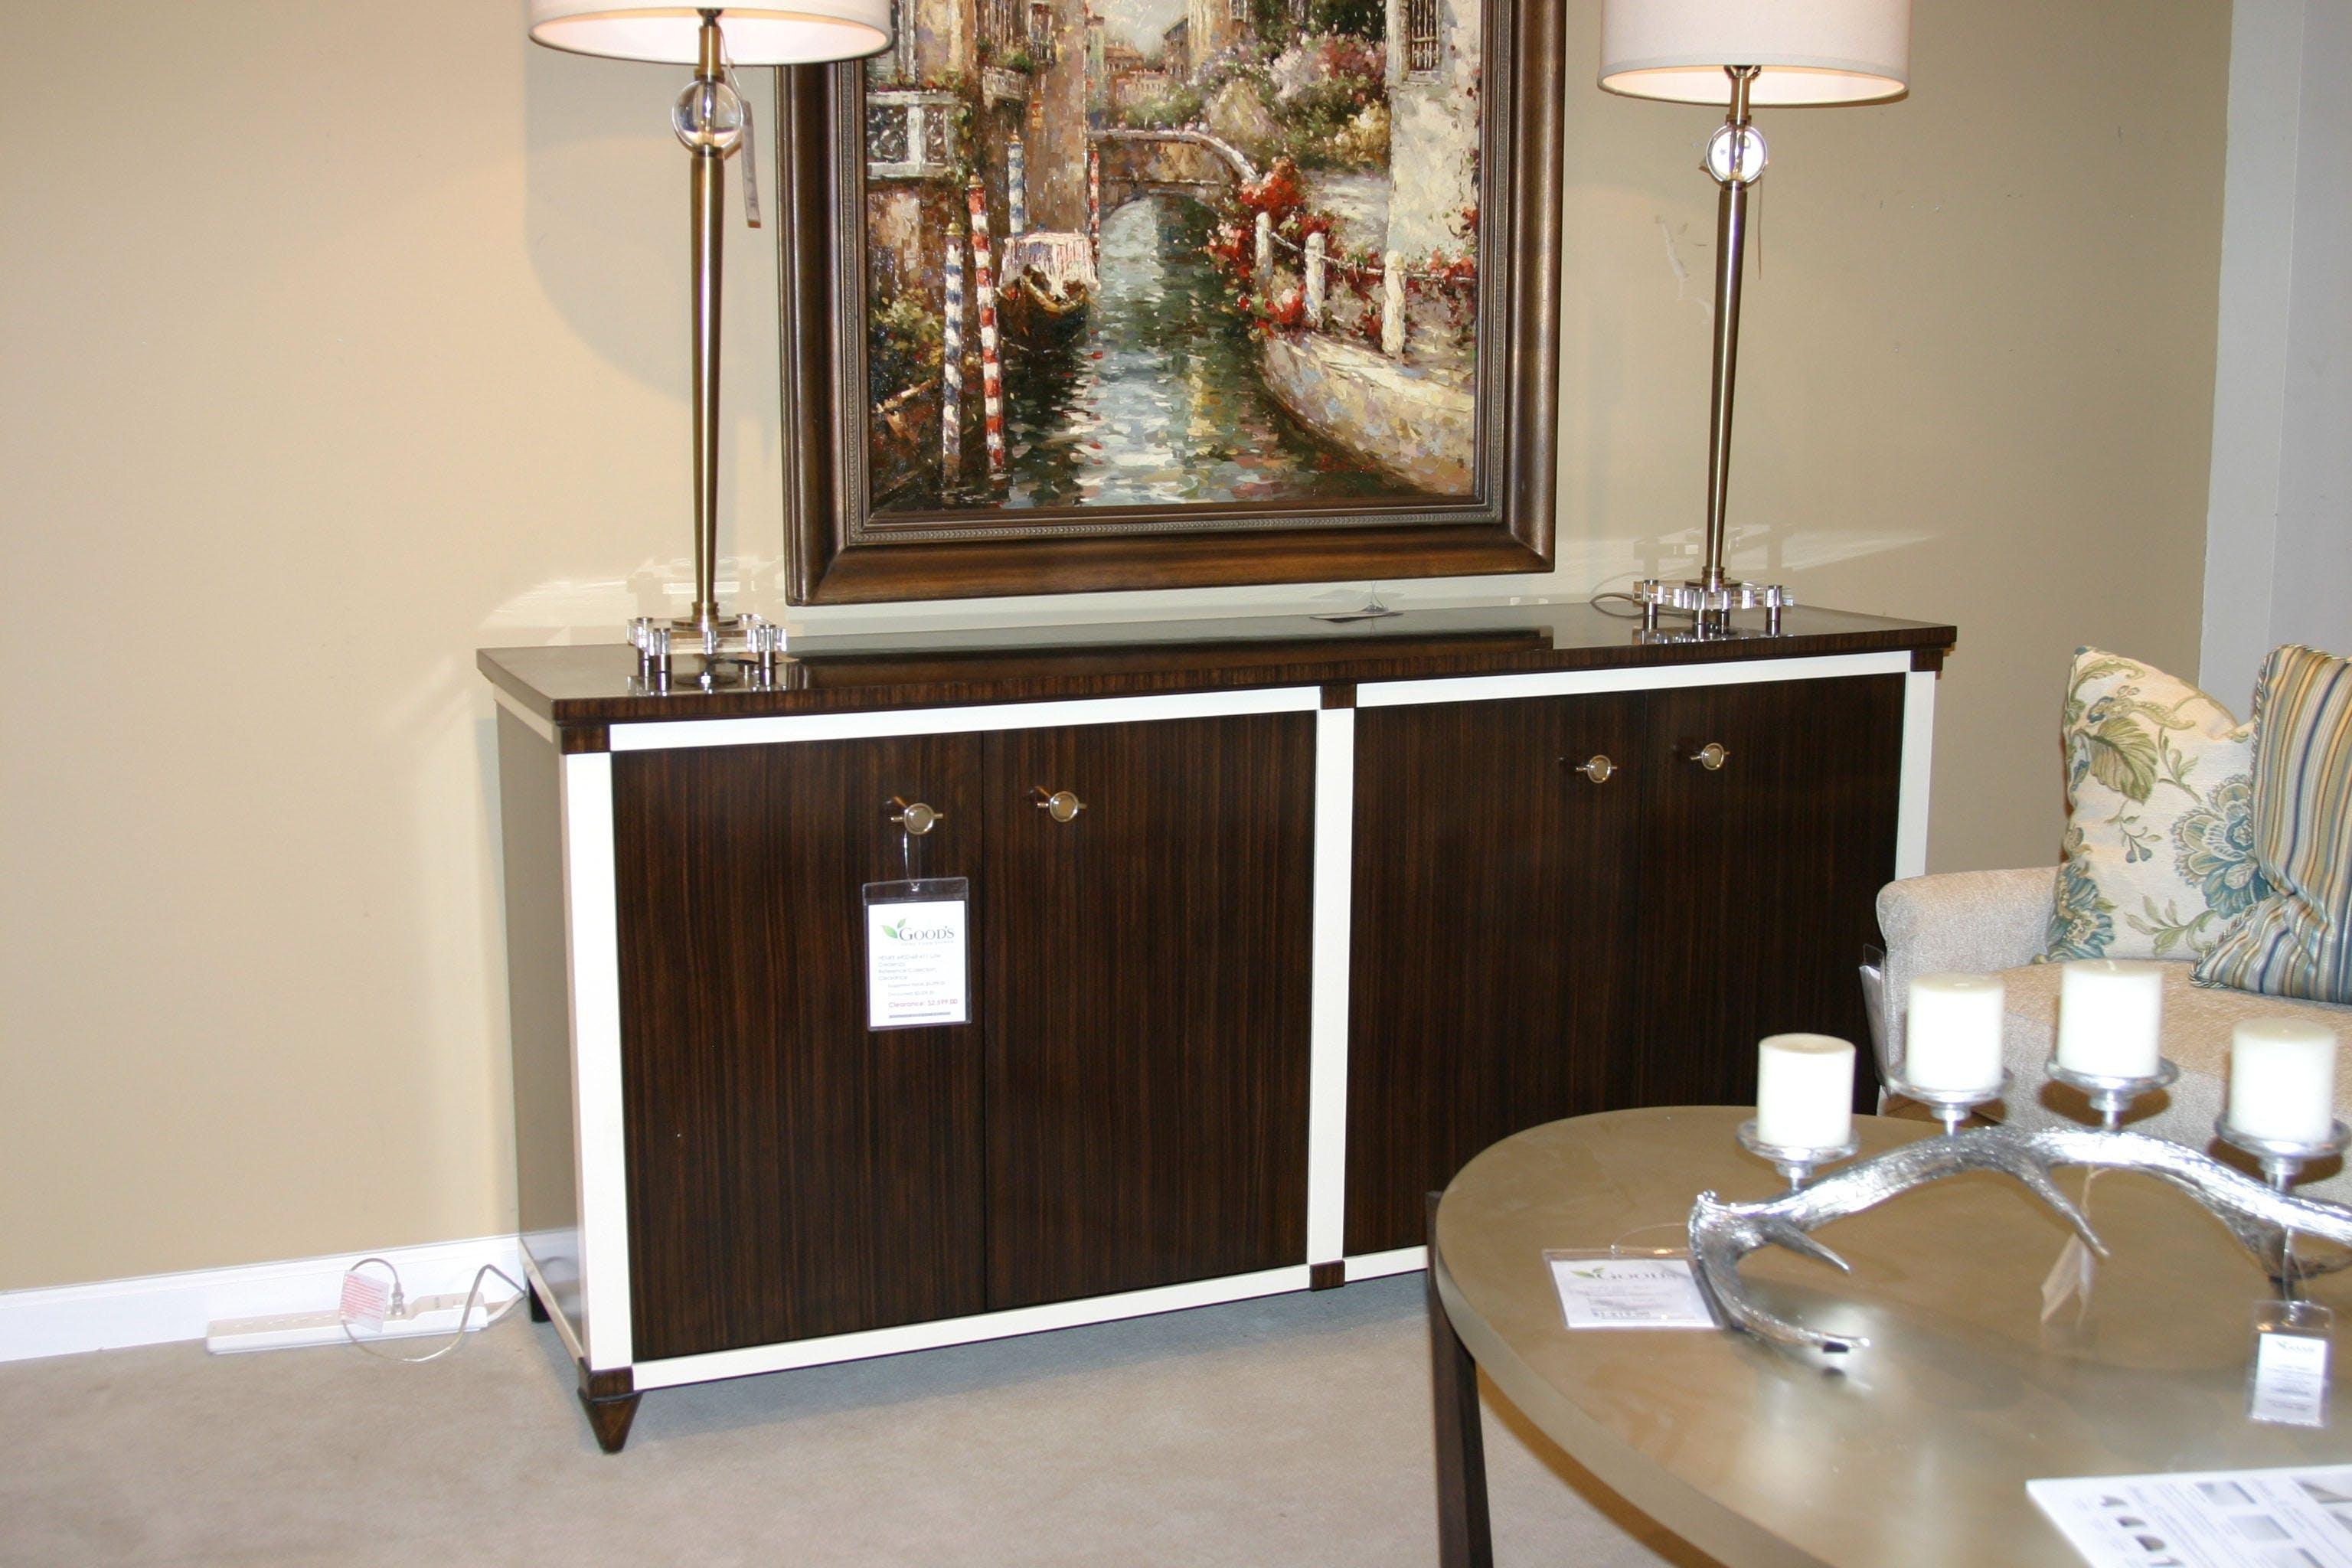 La Credenza Supplier : Dining room low credenza by henredon furniture